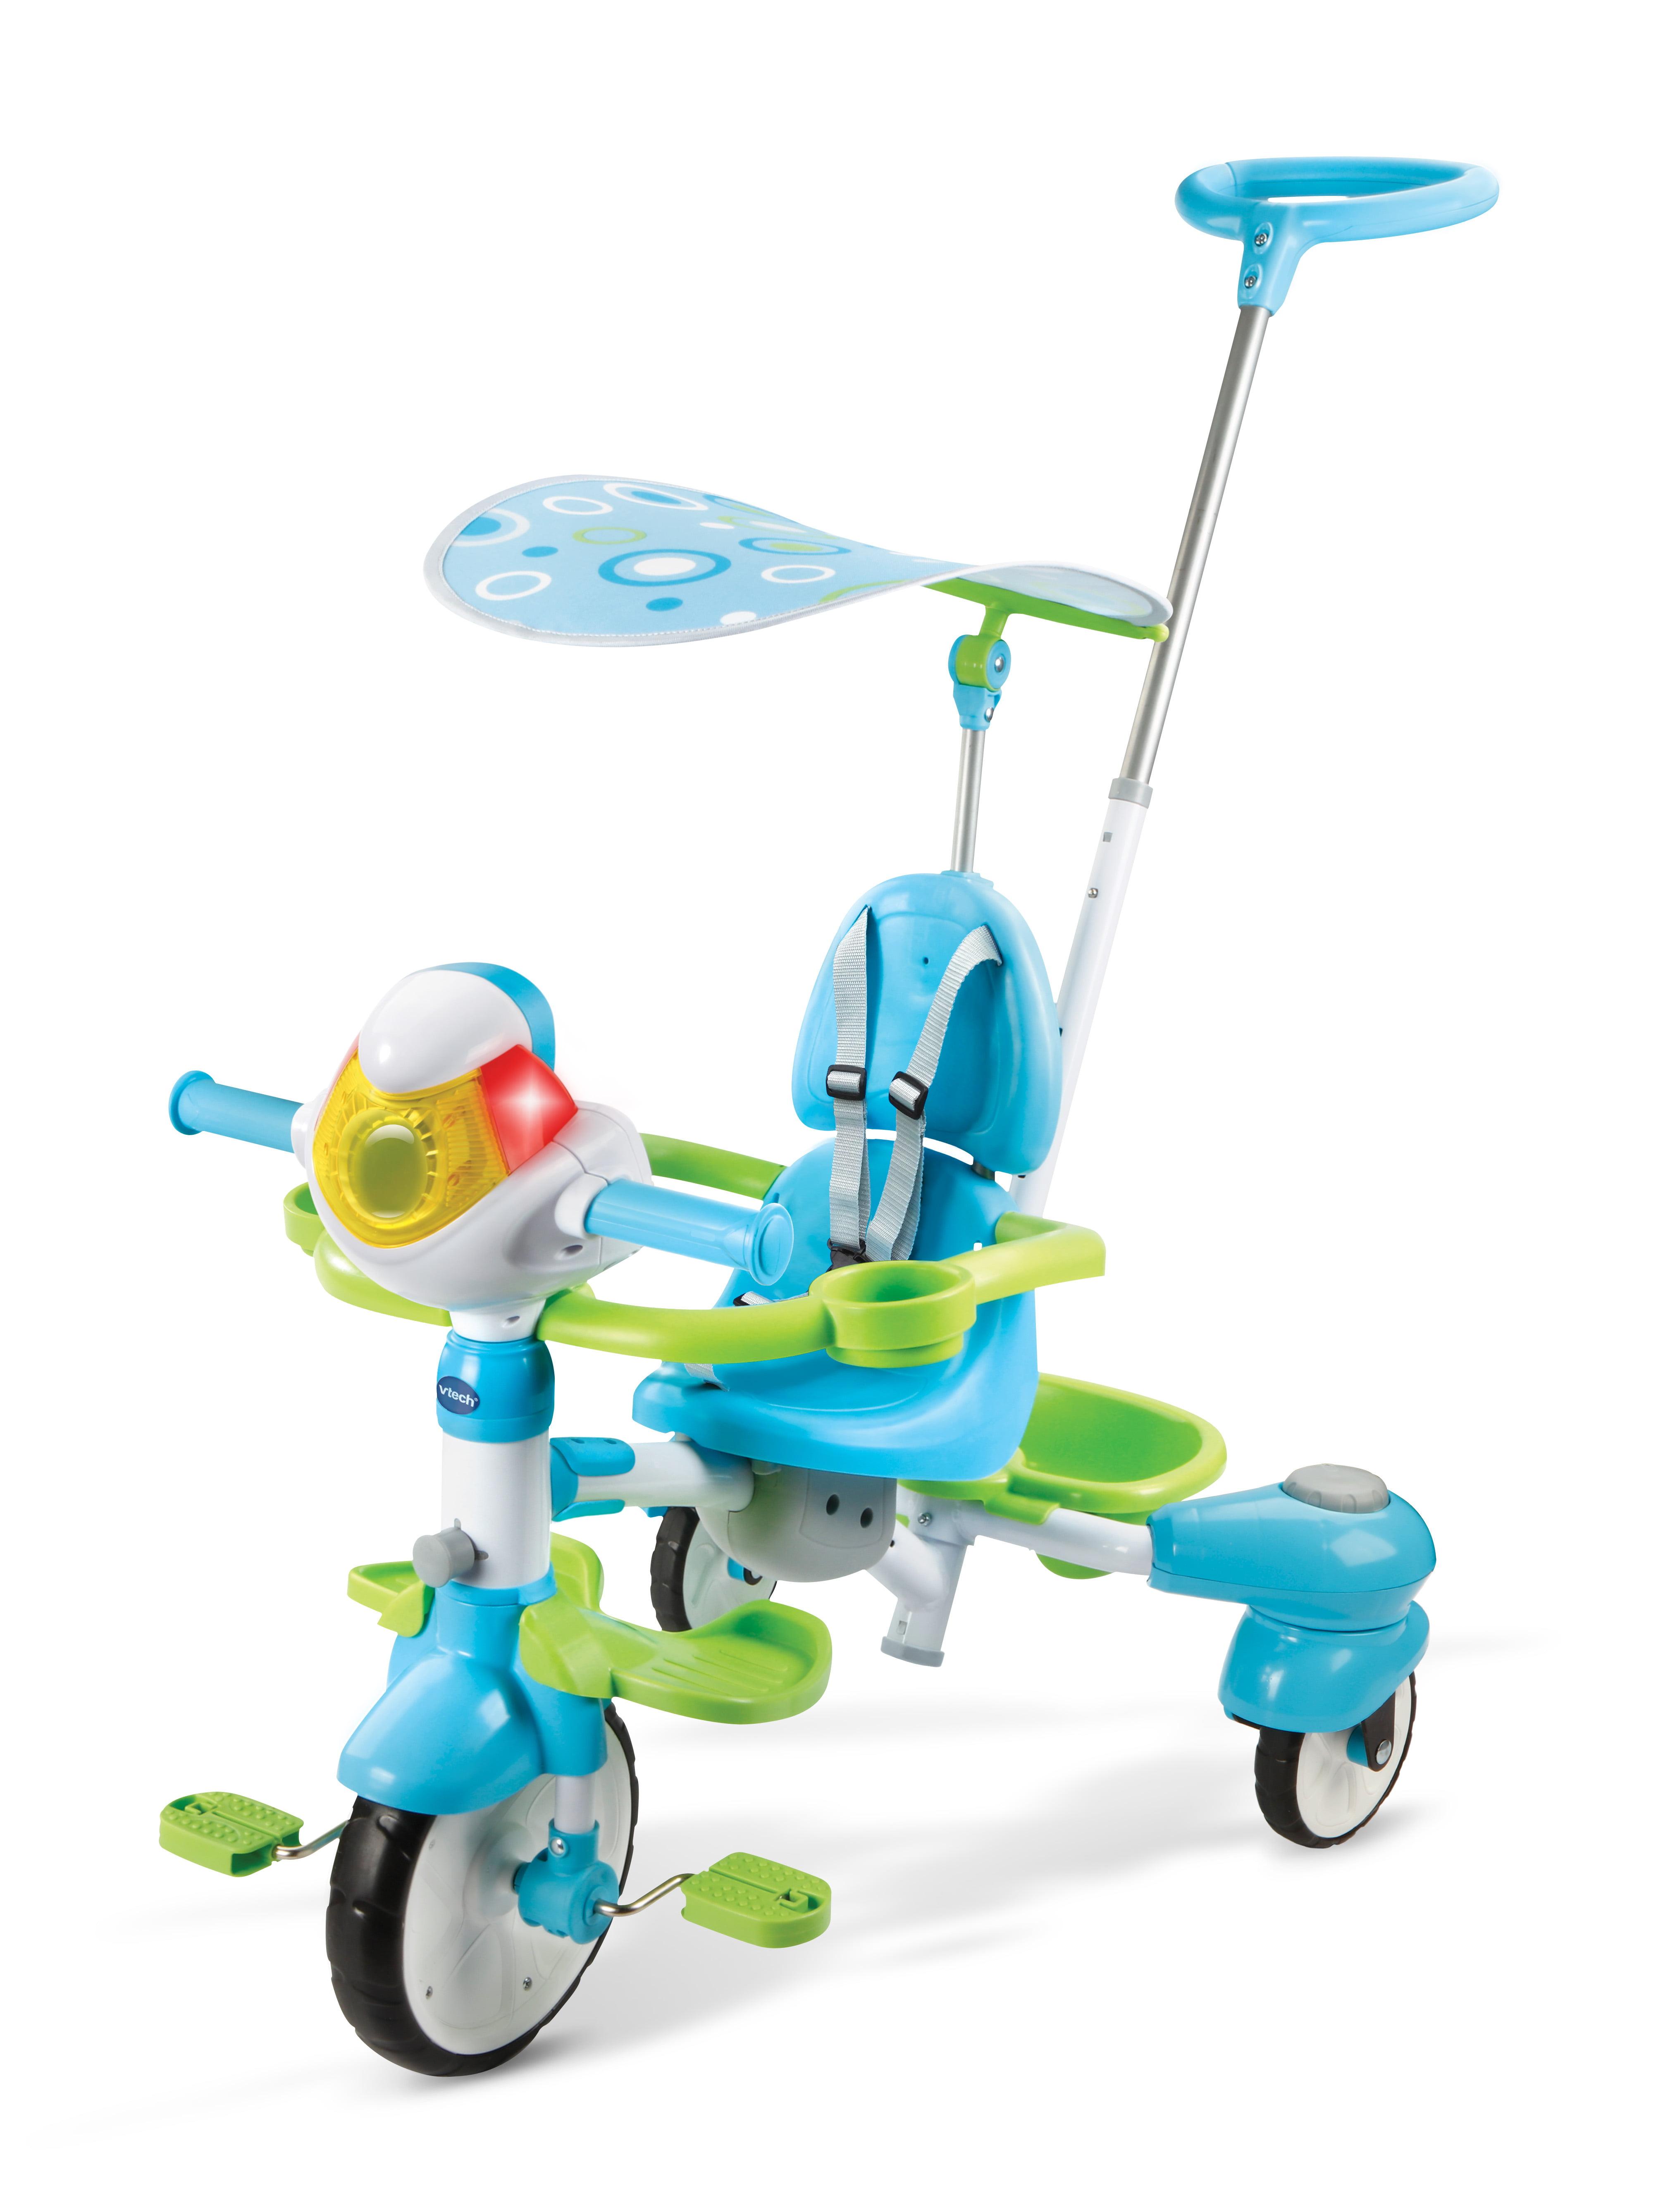 VTech 4-in-1 Stroll & Grow Tek Trike by VTech®